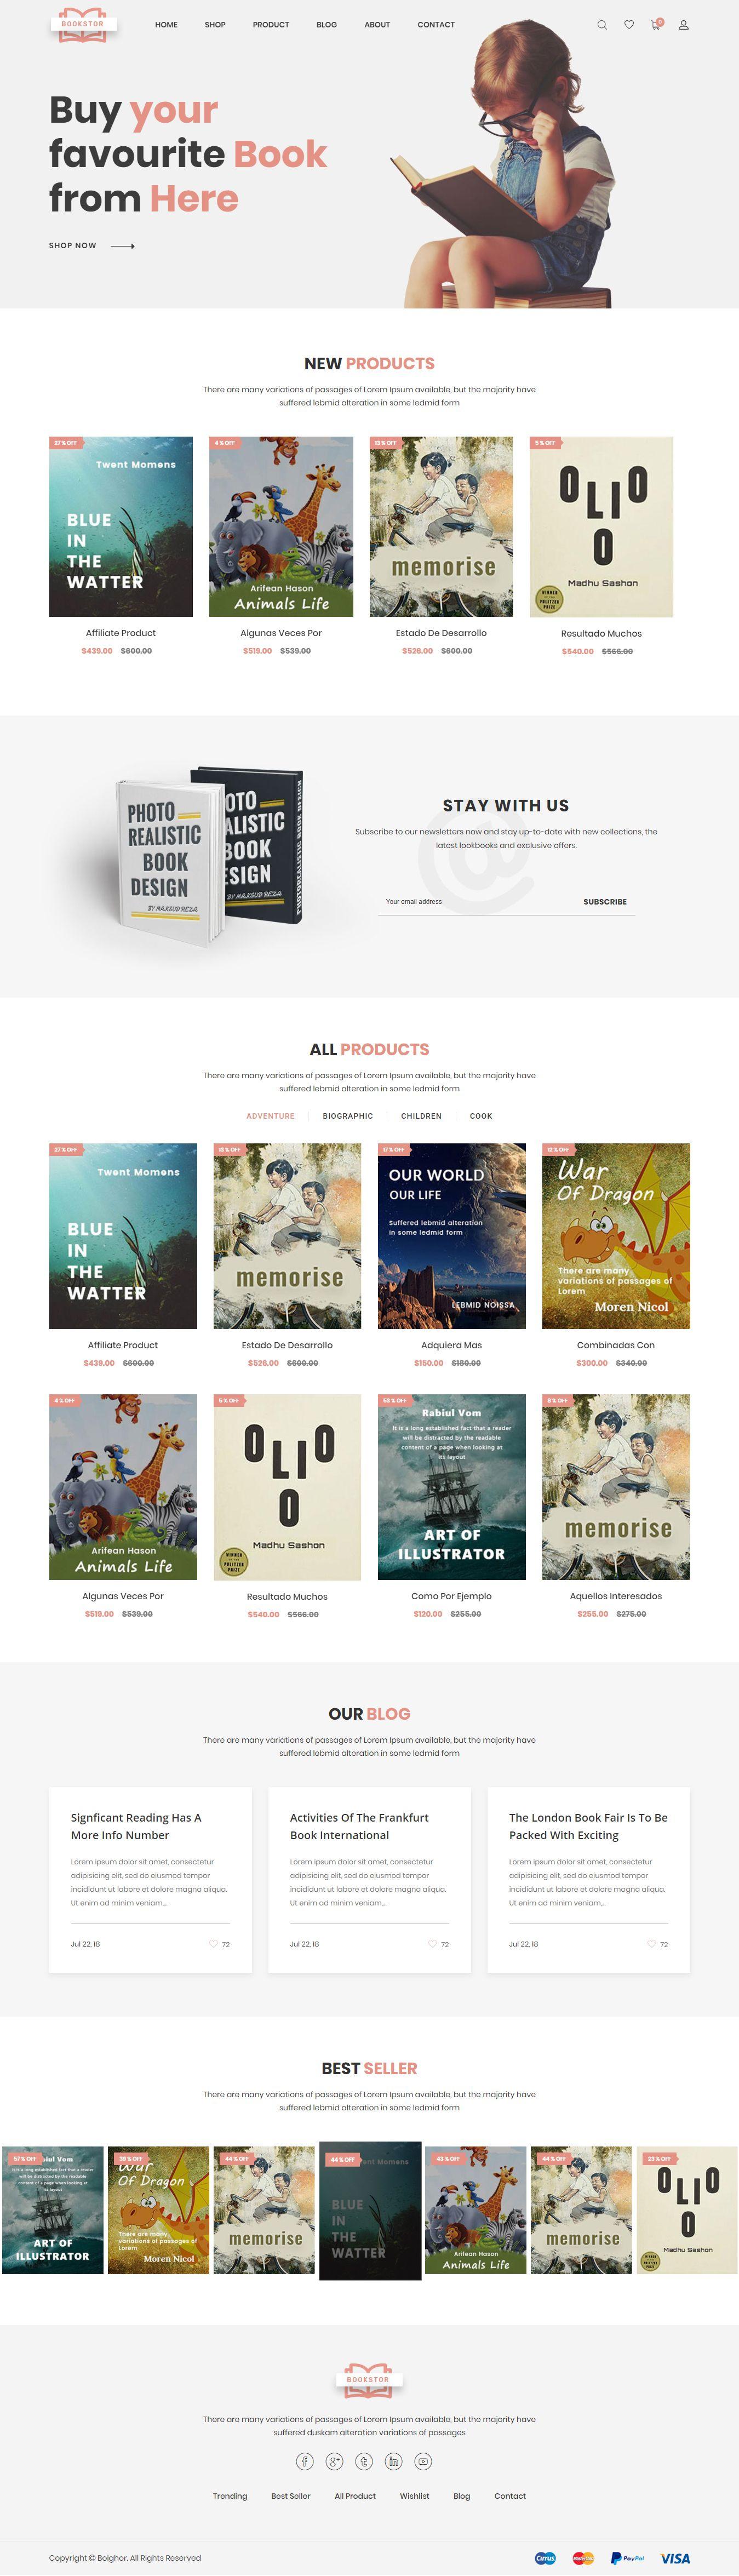 Boighor – Books Library Shopify Theme is a responsive Shopify theme